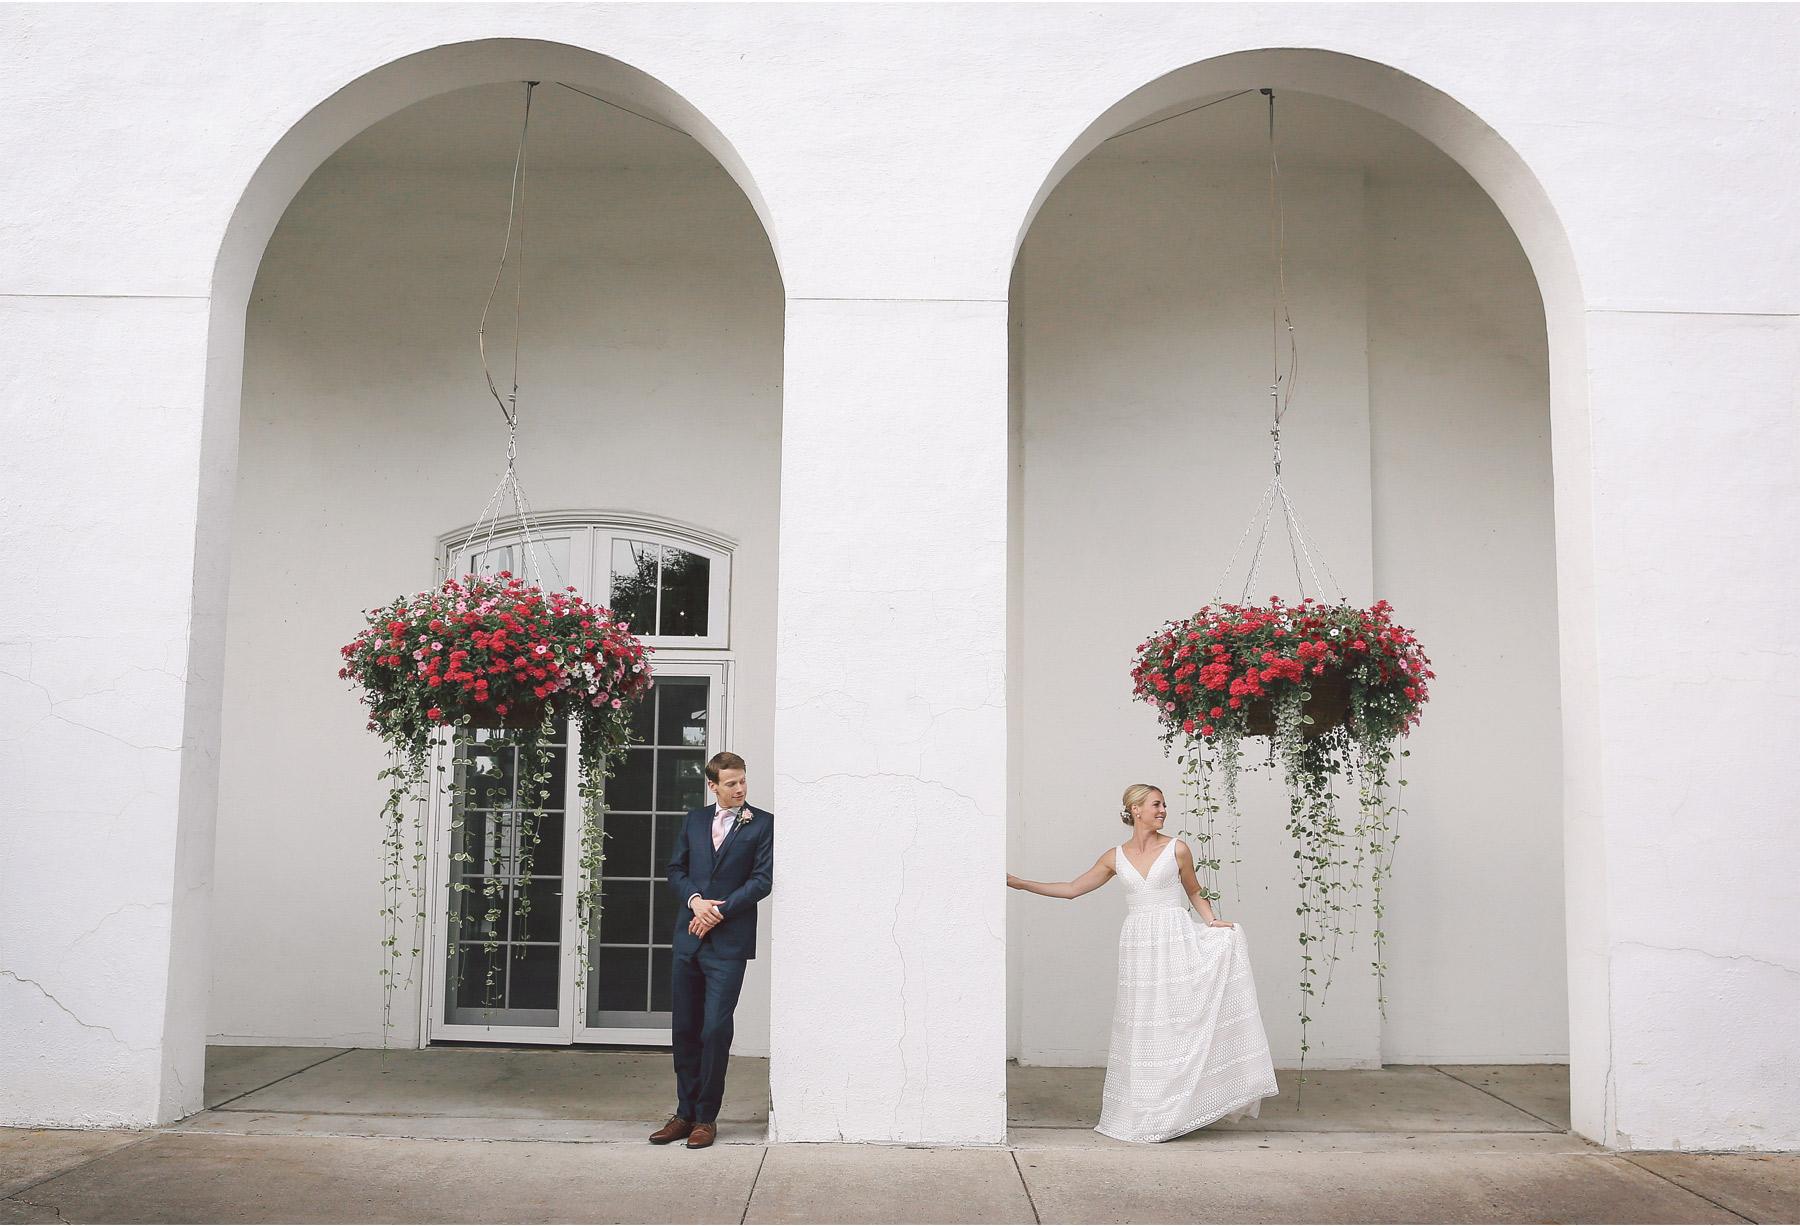 14-Minneapolis-Minnesota-Wedding-Photography-by-Vick-Photography-Lafayette-Club-Maggie-and-Nicholas.jpg